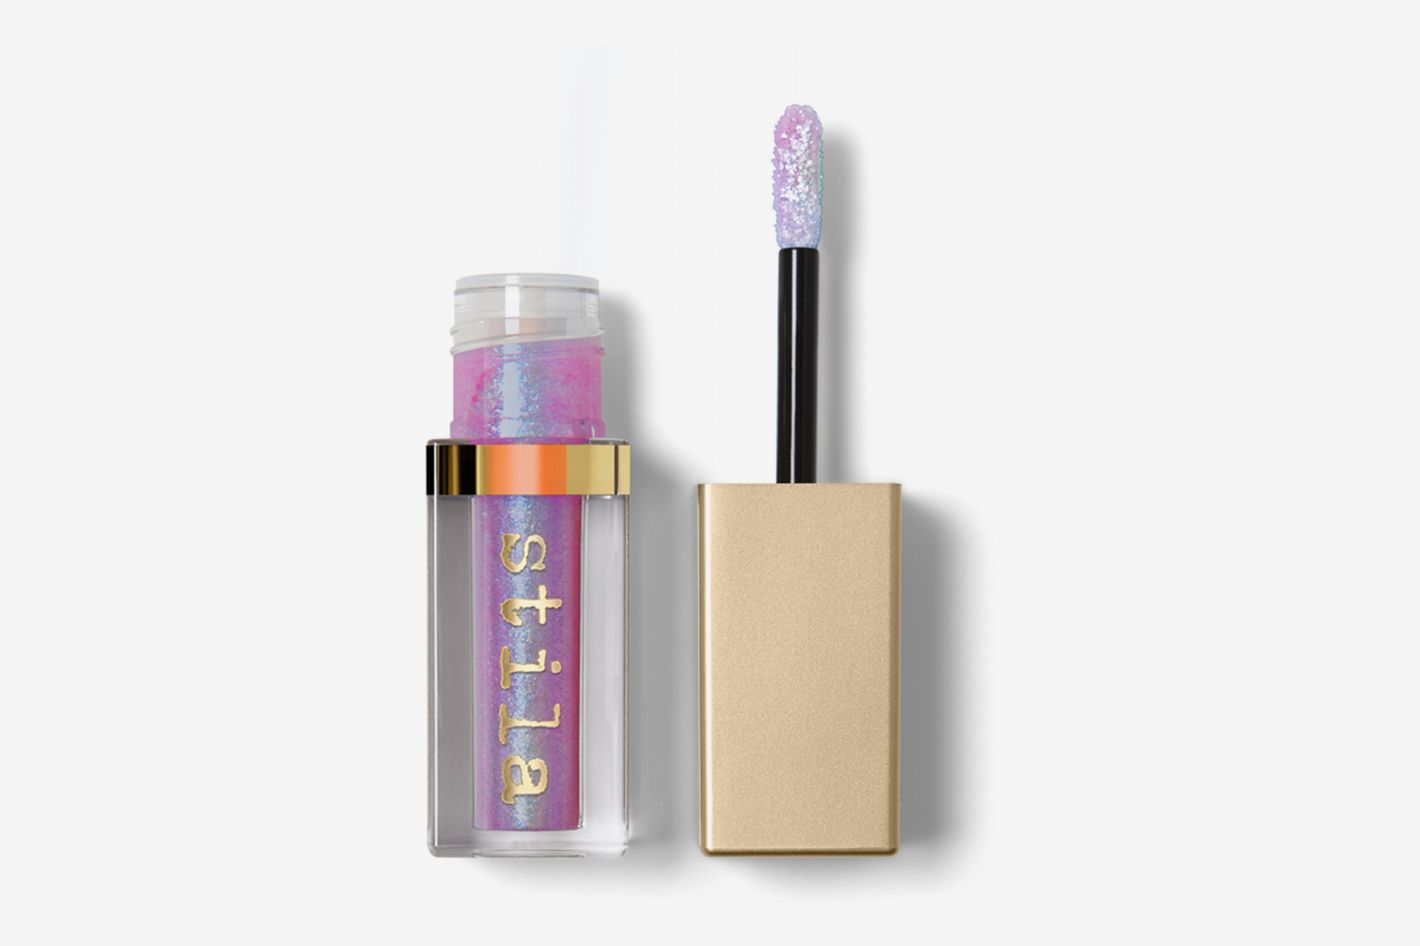 Stila Glitter & Glow Liquid Eyeshadow - Duo Chrome Shades, Sea Siren